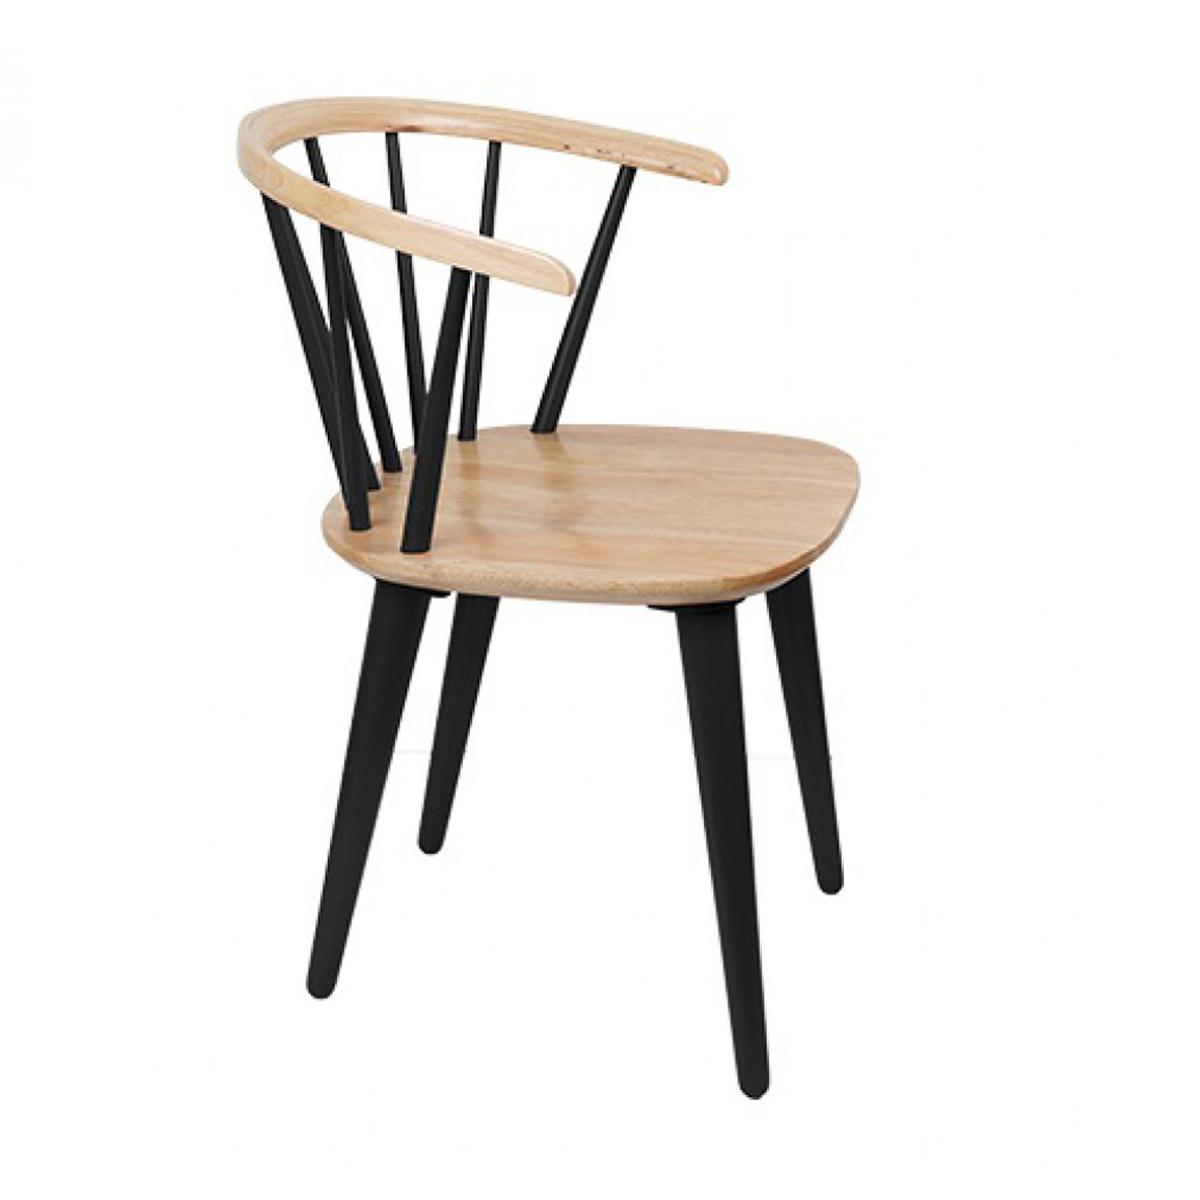 Gee zuiver evolution for Zuiver stoelen